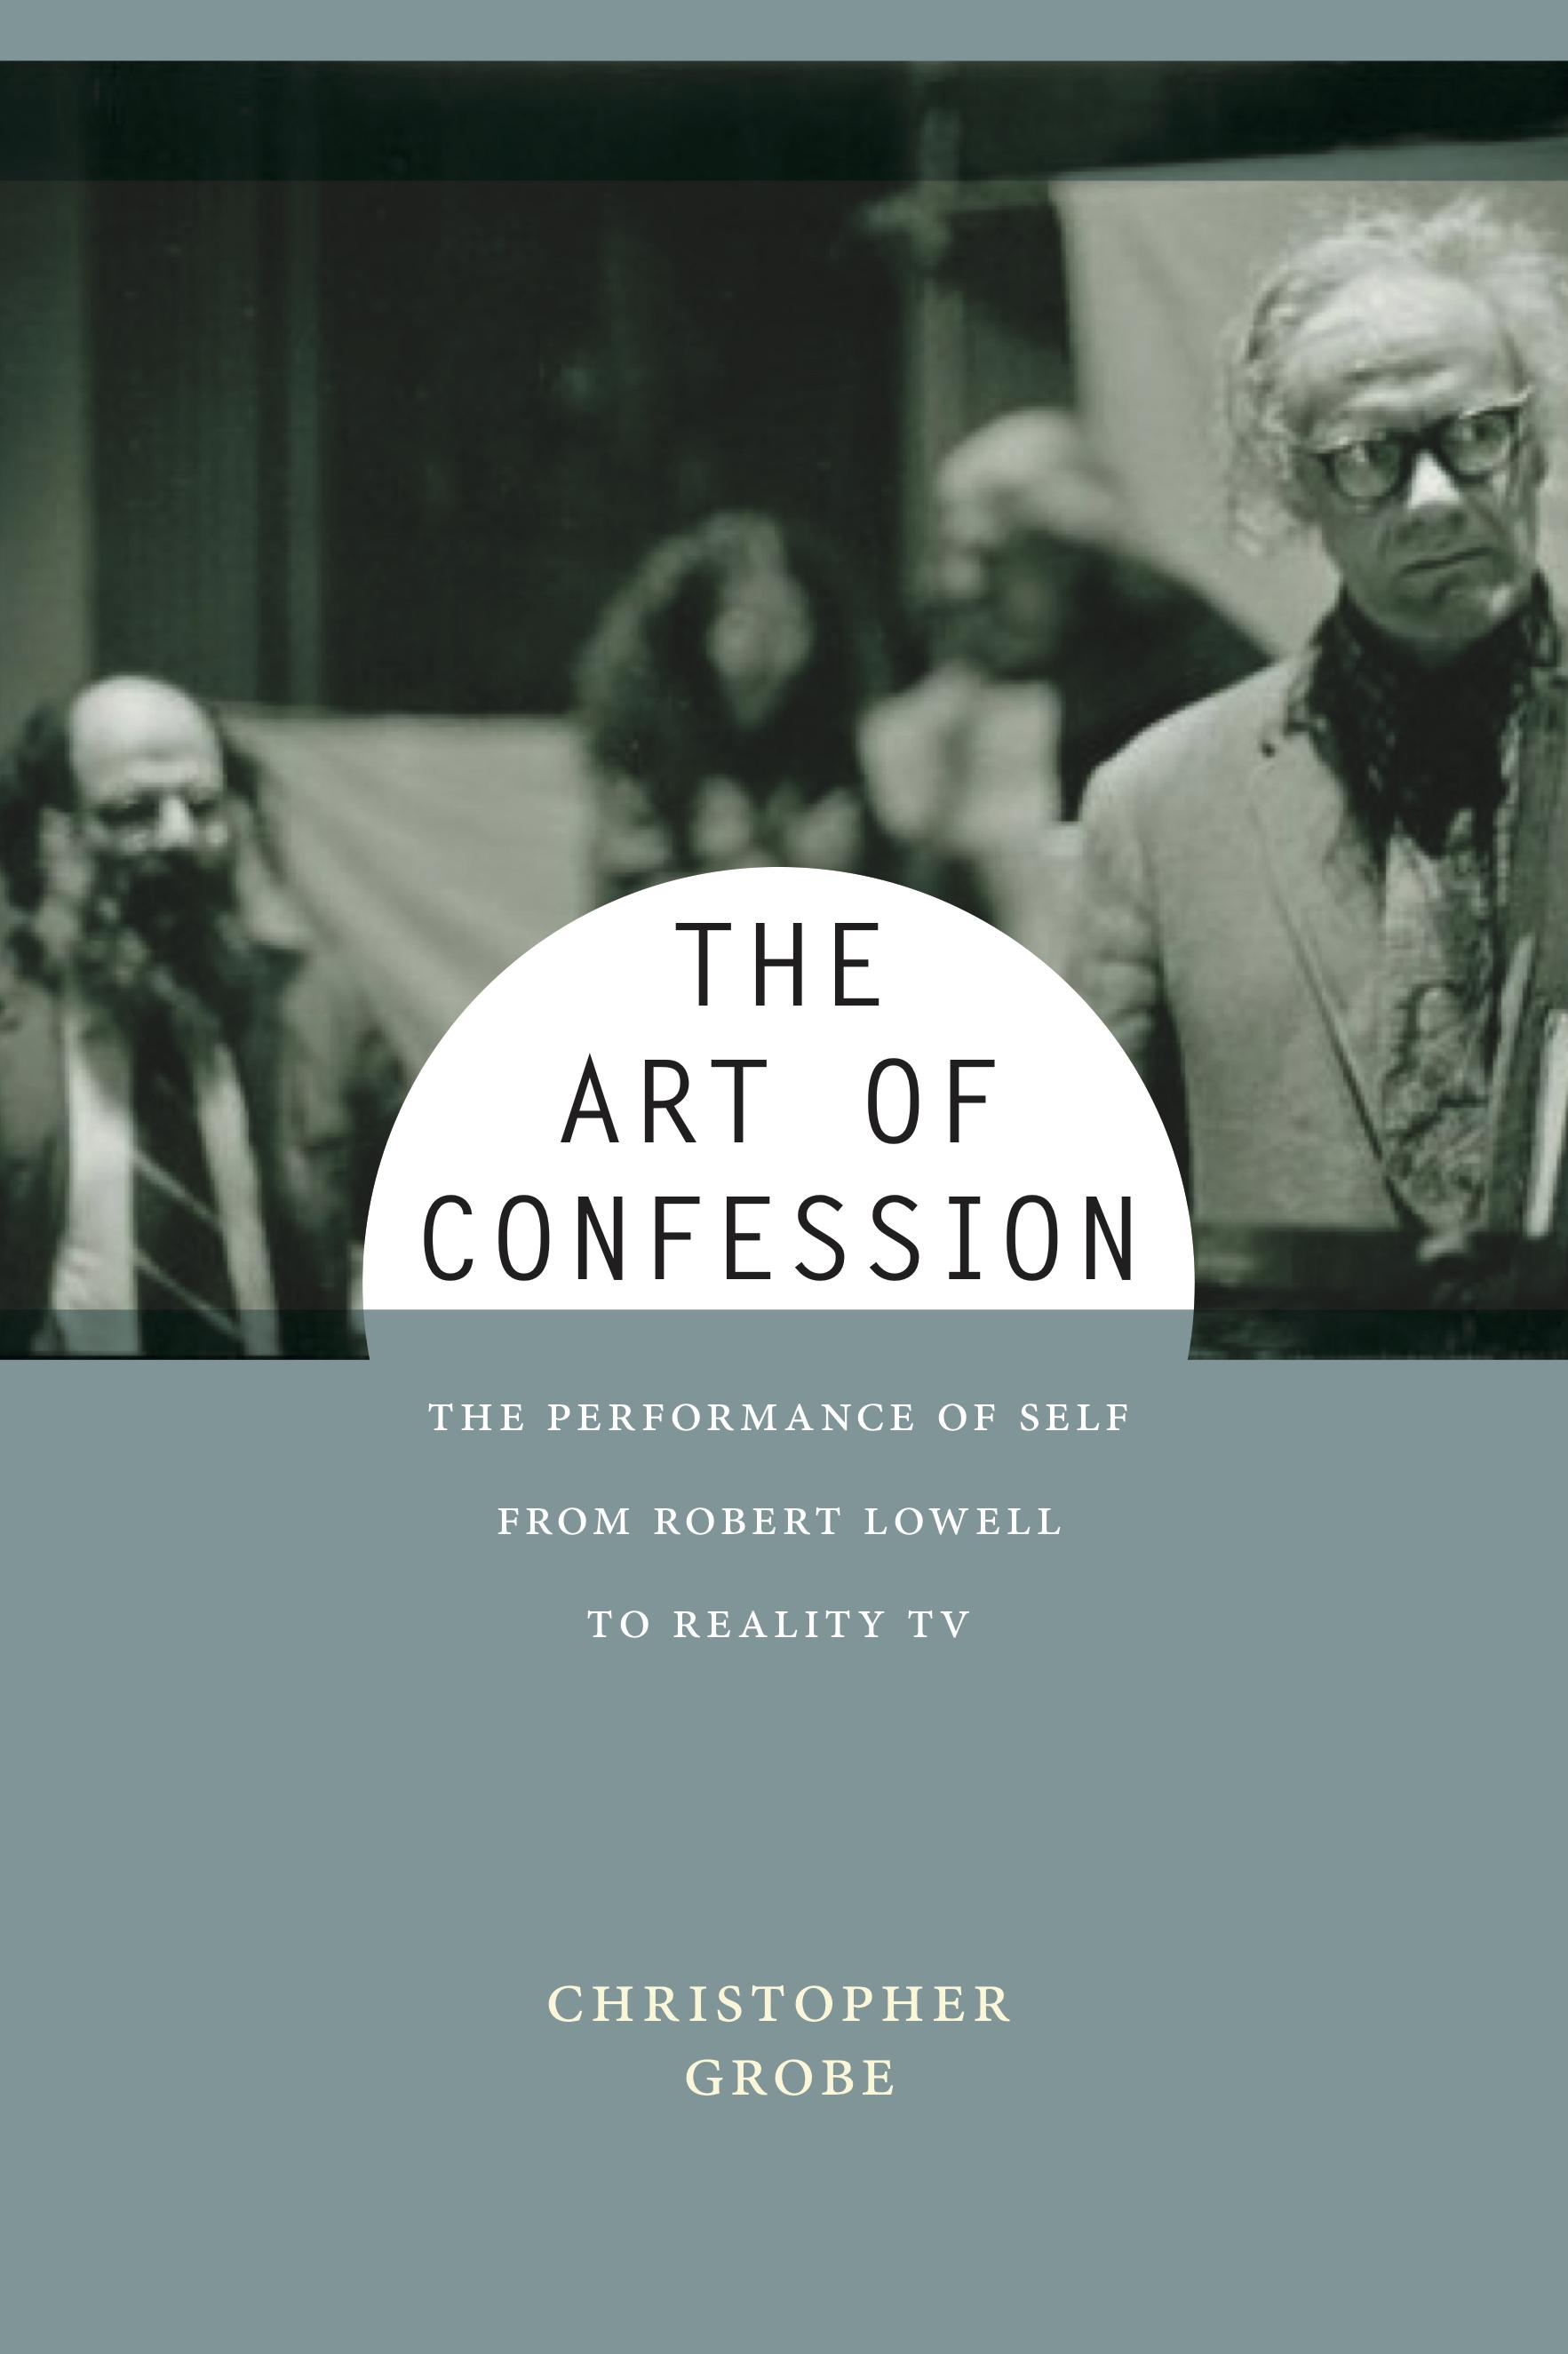 Art of Confession.jpg